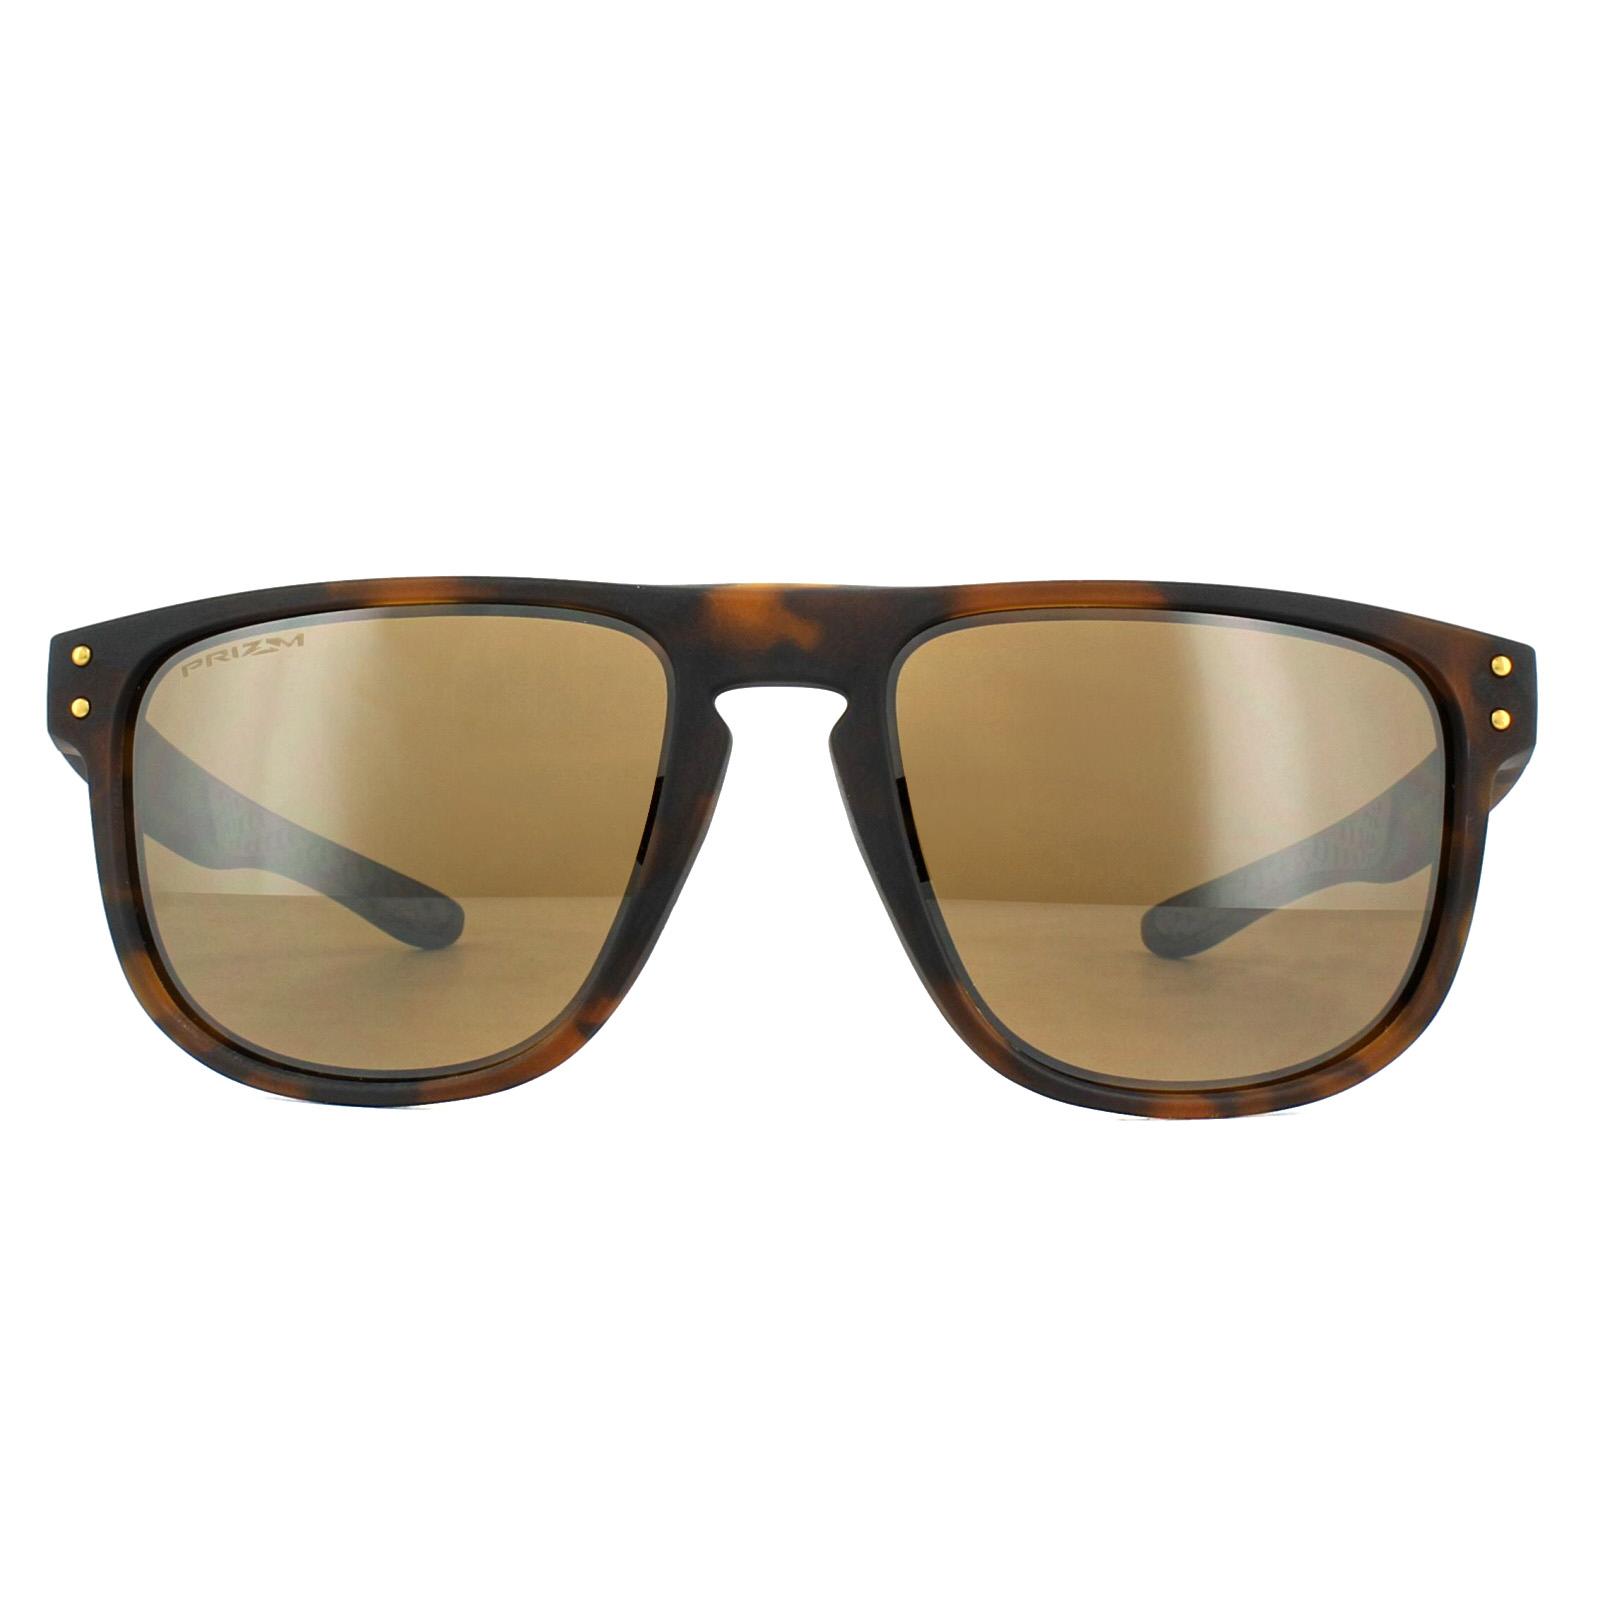 b8323c002ab Sentinel Oakley Sunglasses Holbrook R OO9377-06 Dark Tortoise Prizm  Tungsten Polarized